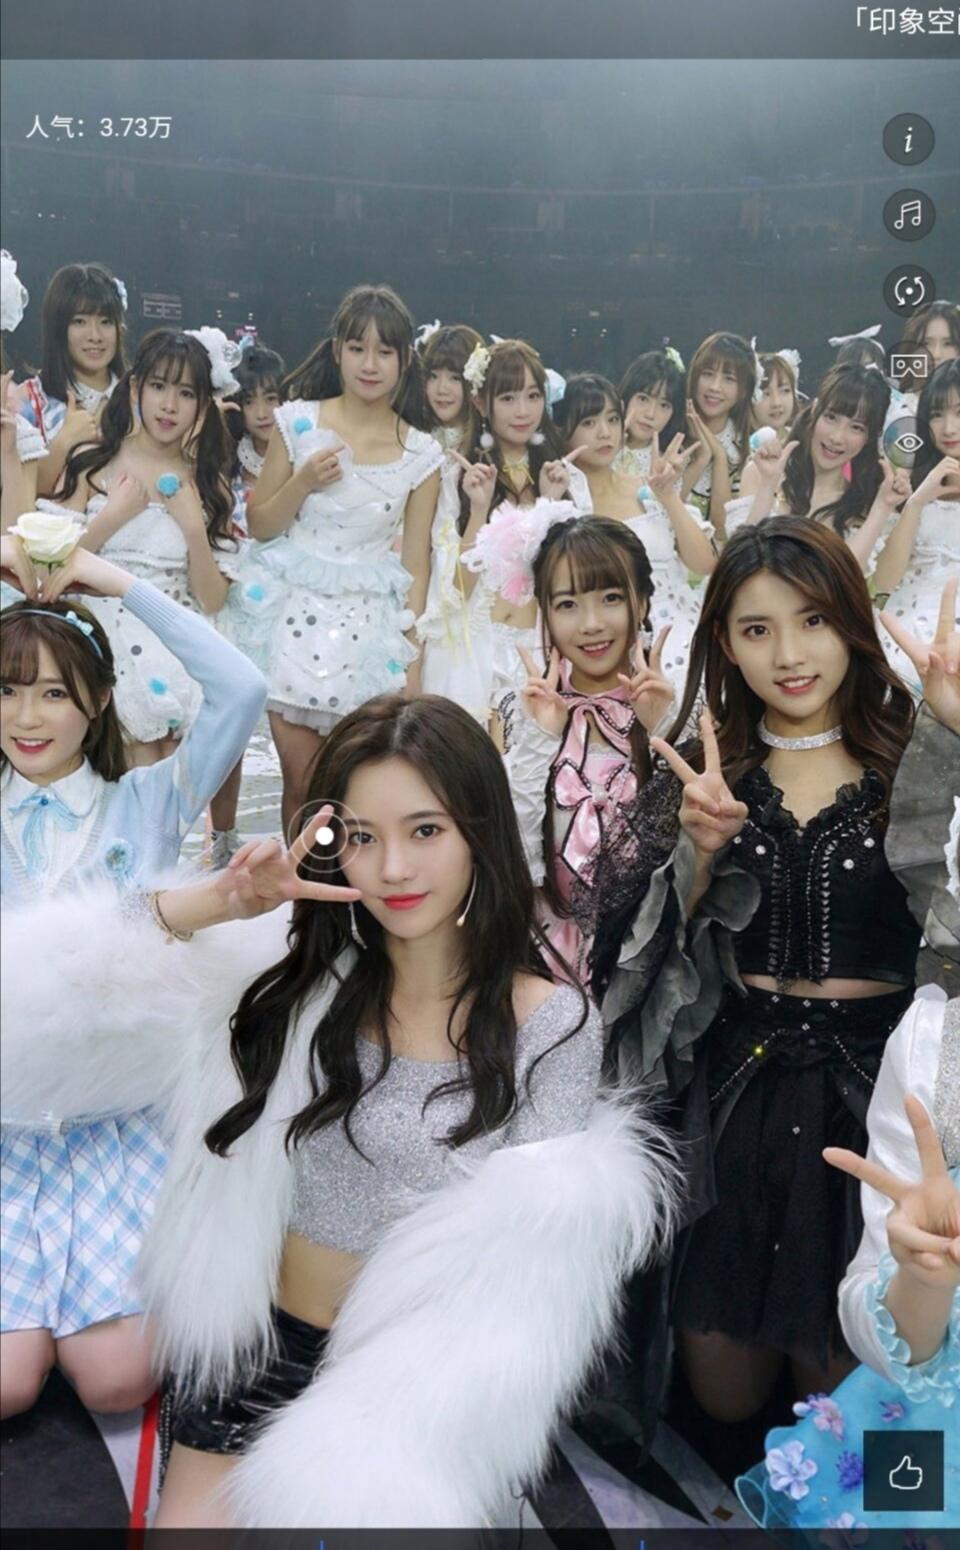 snh48 group第三届年度金曲大赏全景VR观看